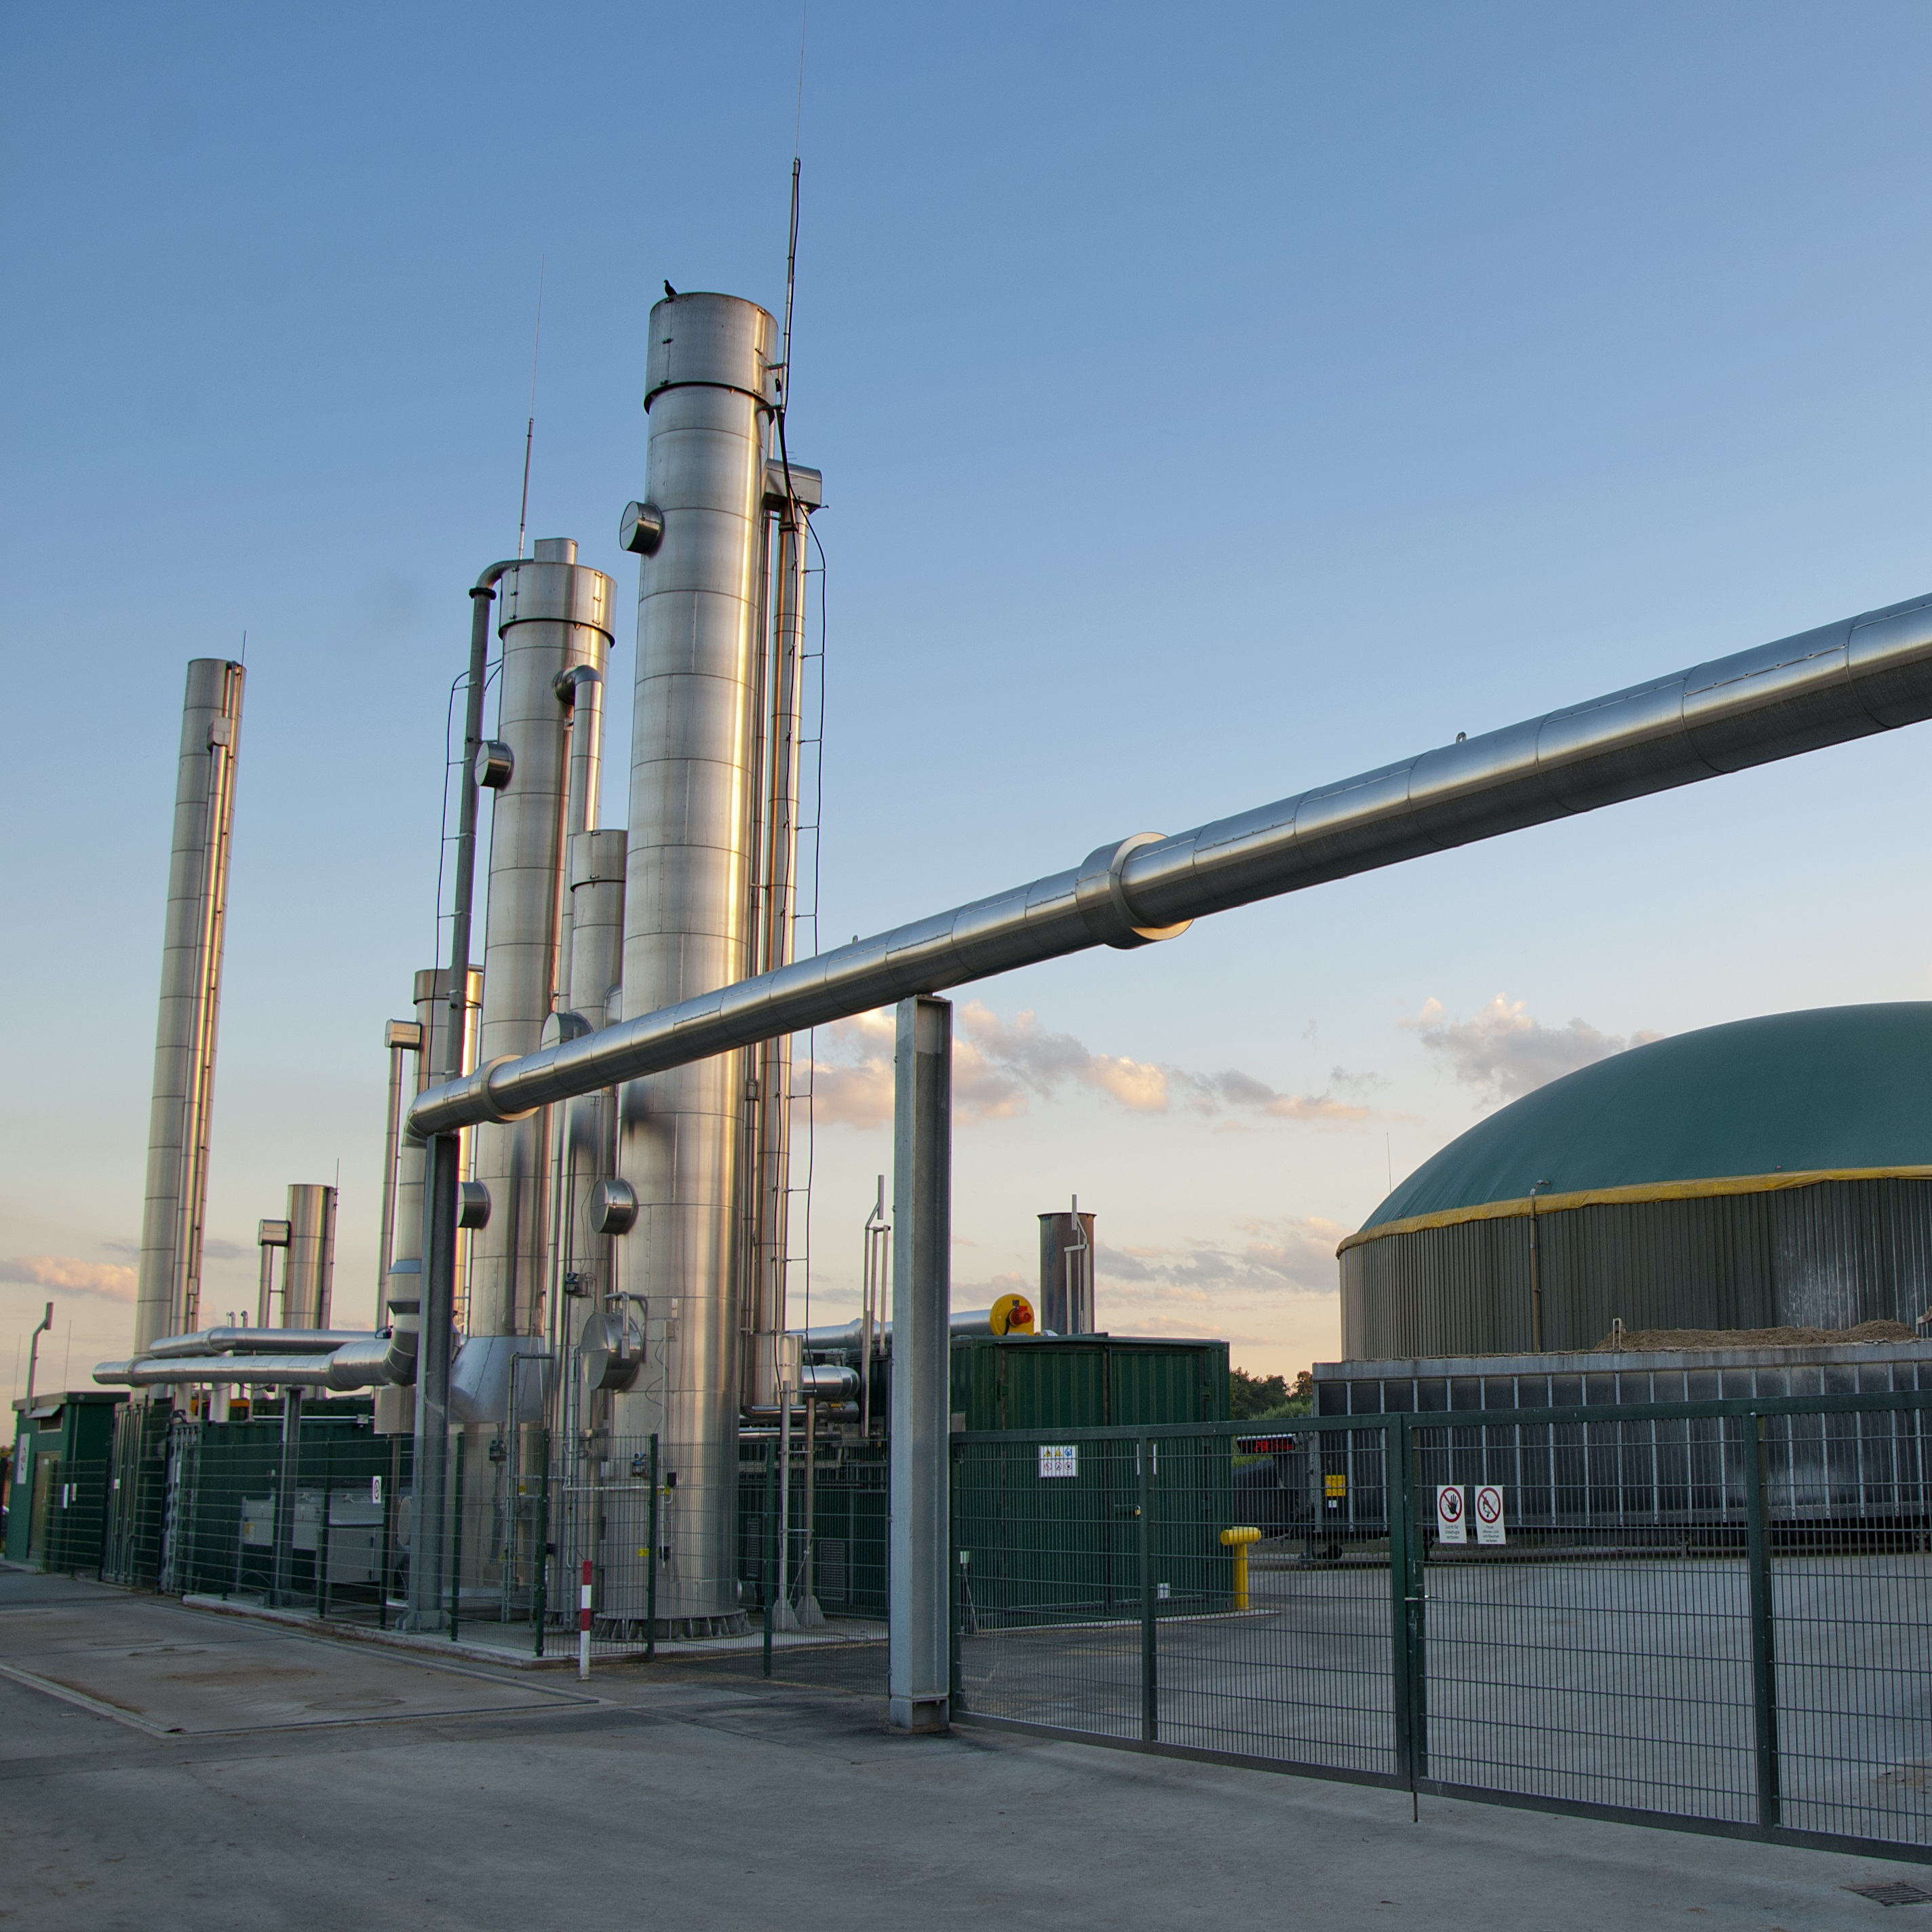 Landfill gas plant